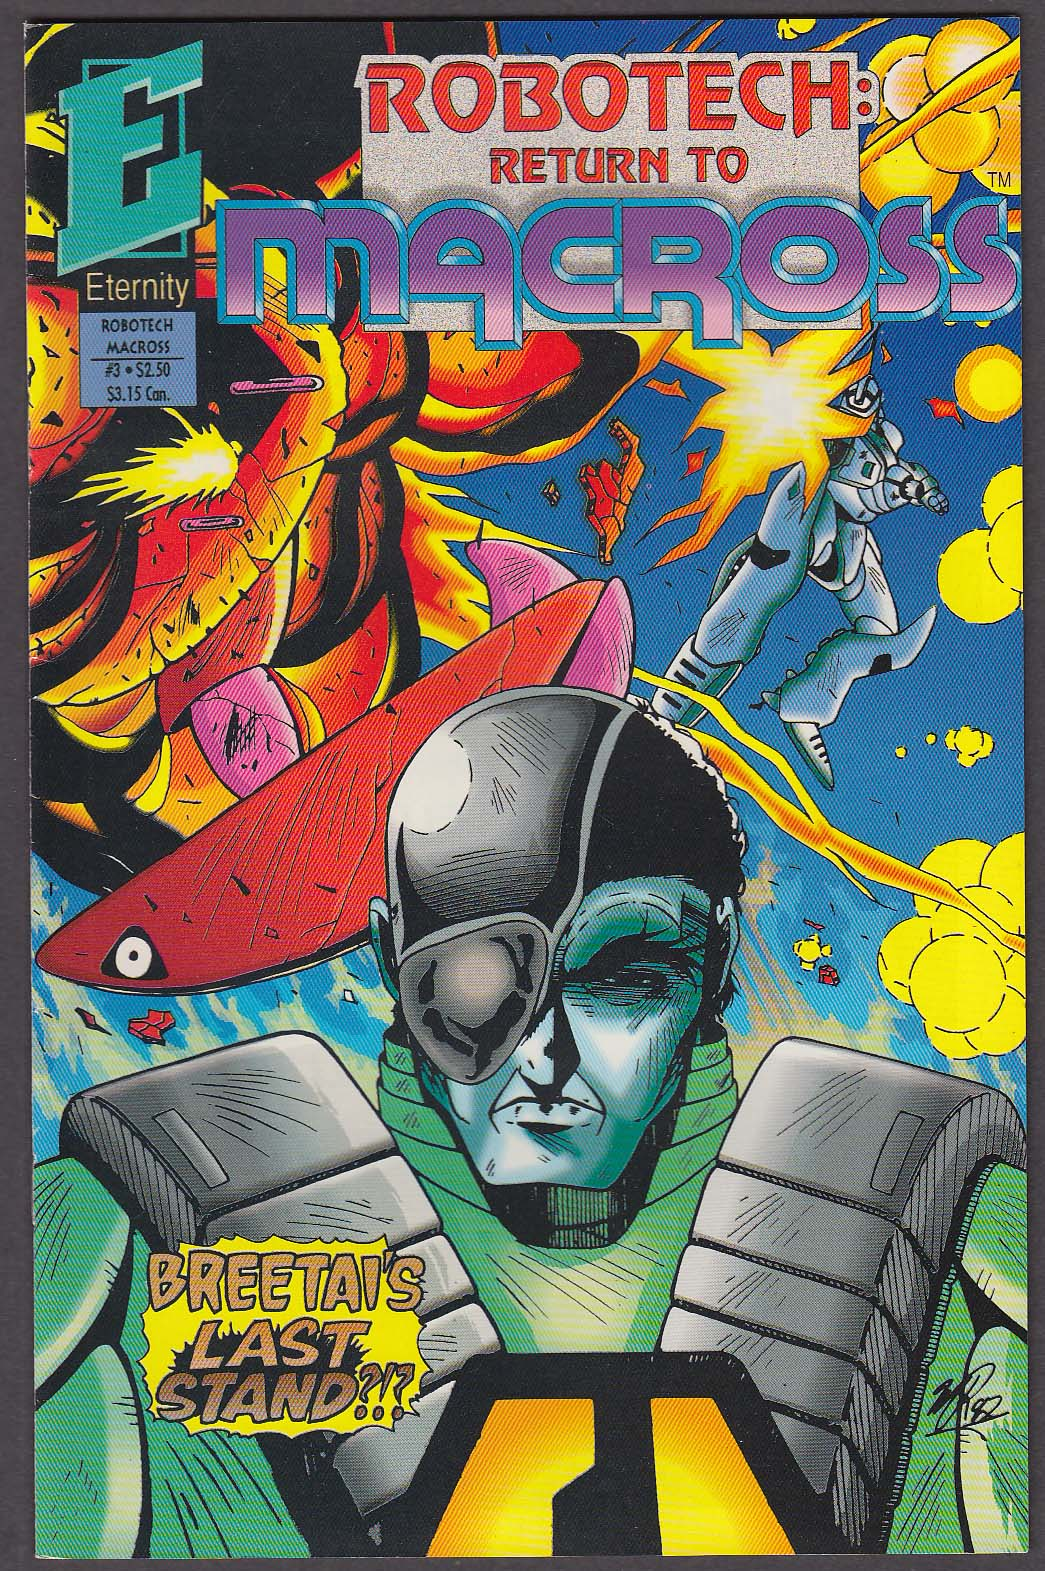 Image for ROBOTECH: RETURN TO MACROSS #3 Eternity comic book 5 1993